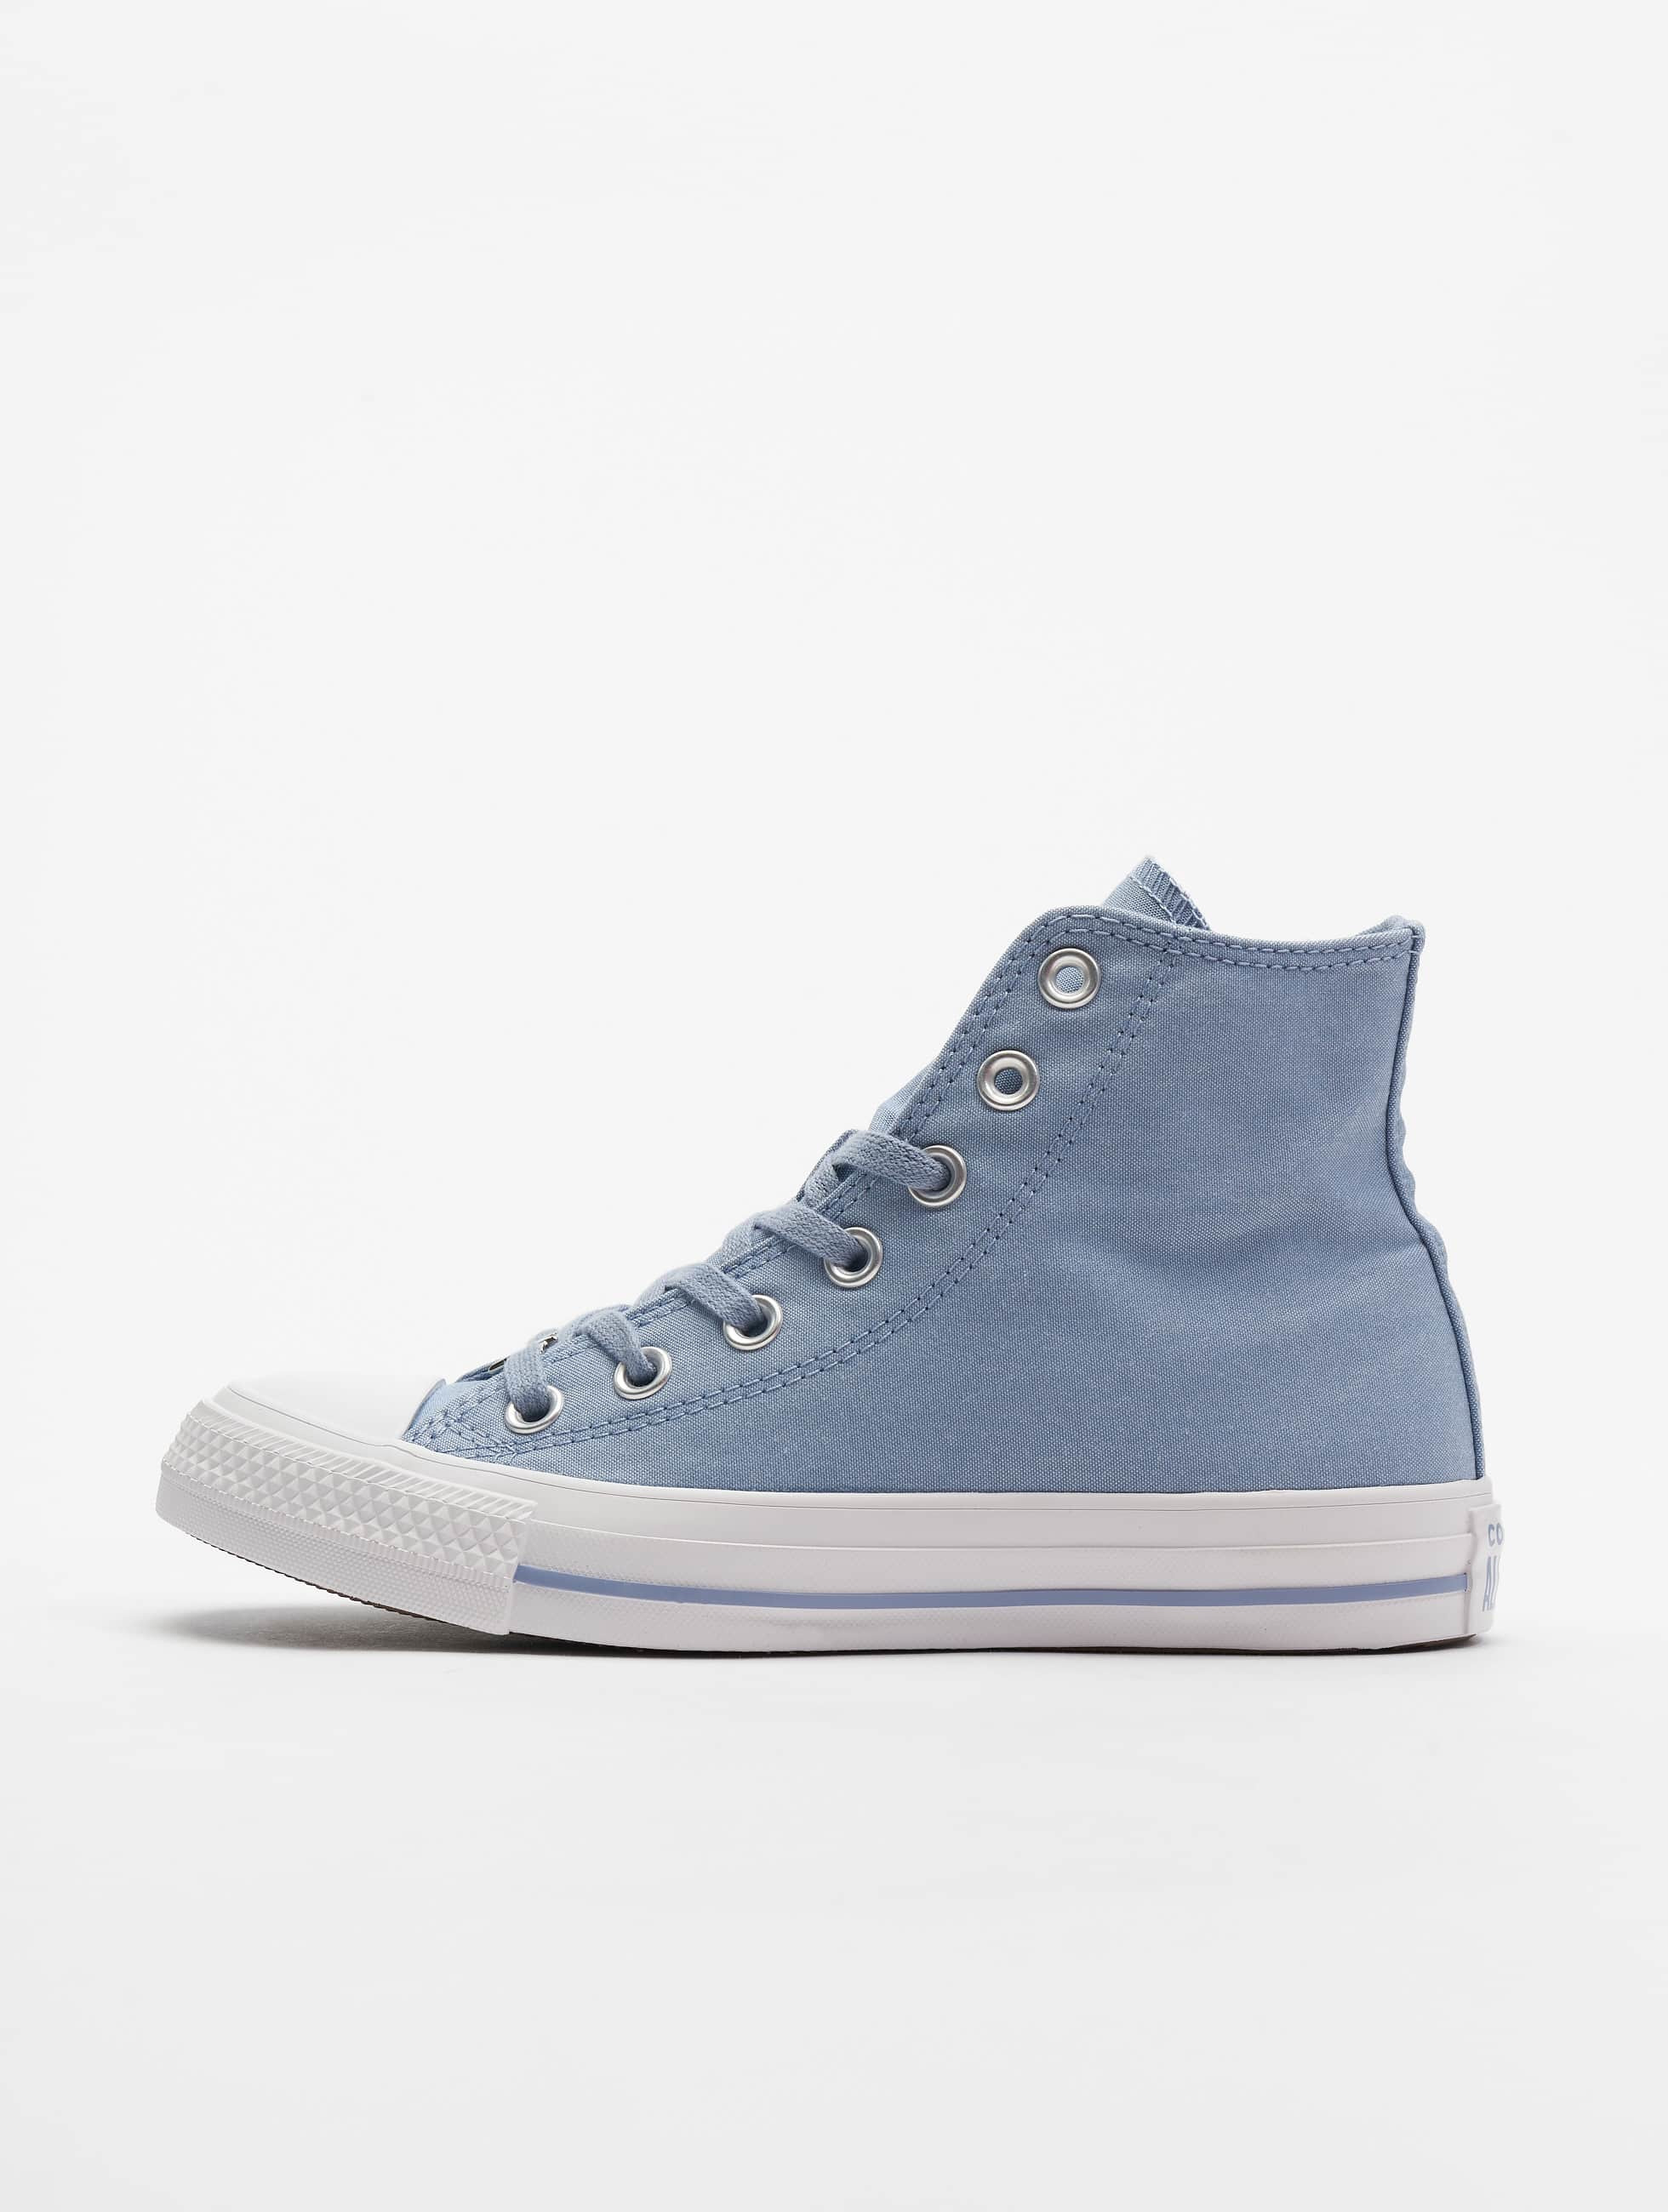 Converse Chuck Tailor All Star Hi Sneakers Indigo FogWhiteWhite